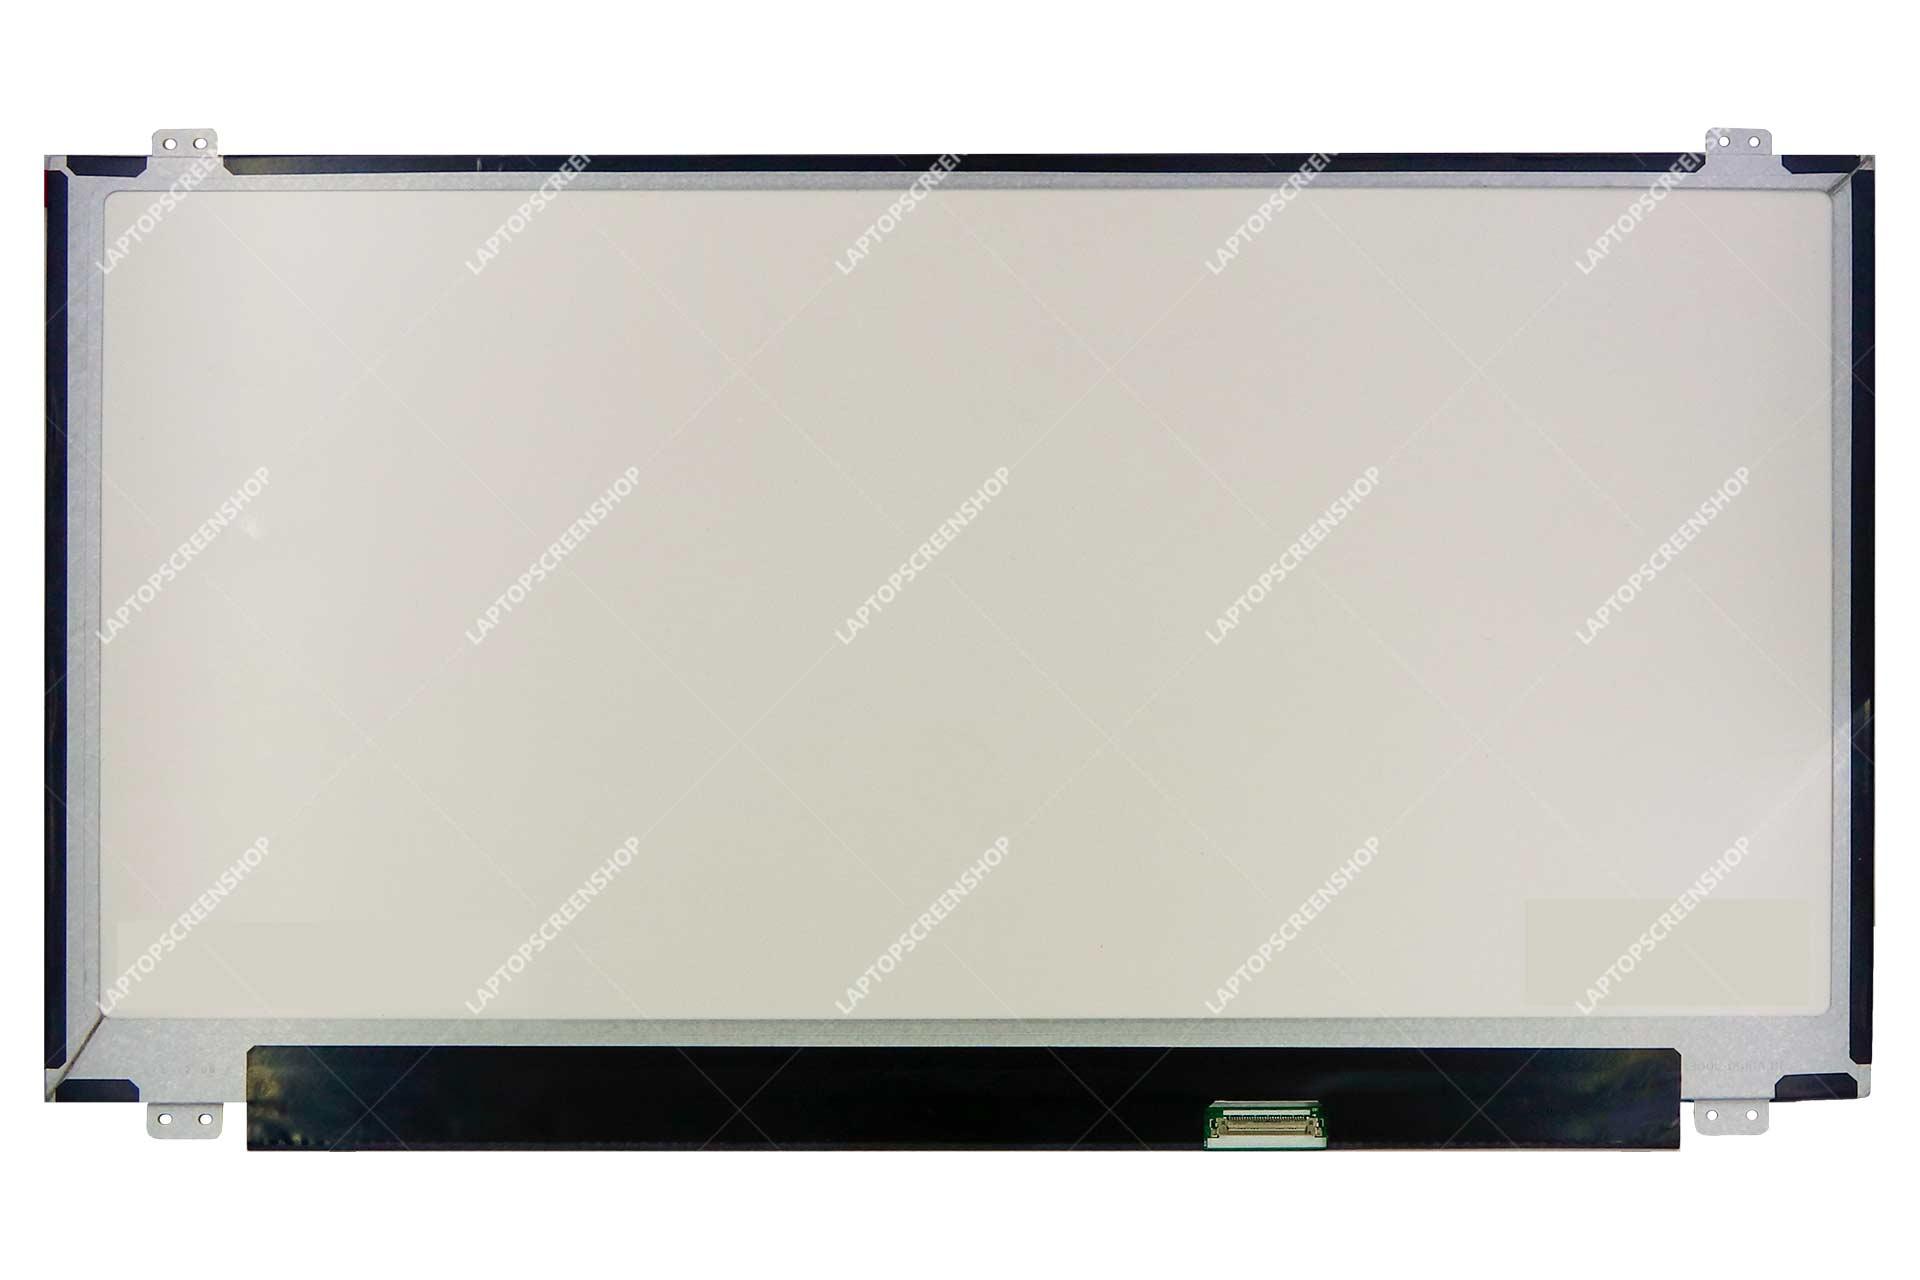 ACER-ASPIRE-E1-472-6851-LCD |HD|فروشگاه لپ تاپ اسکرين | تعمير لپ تاپ